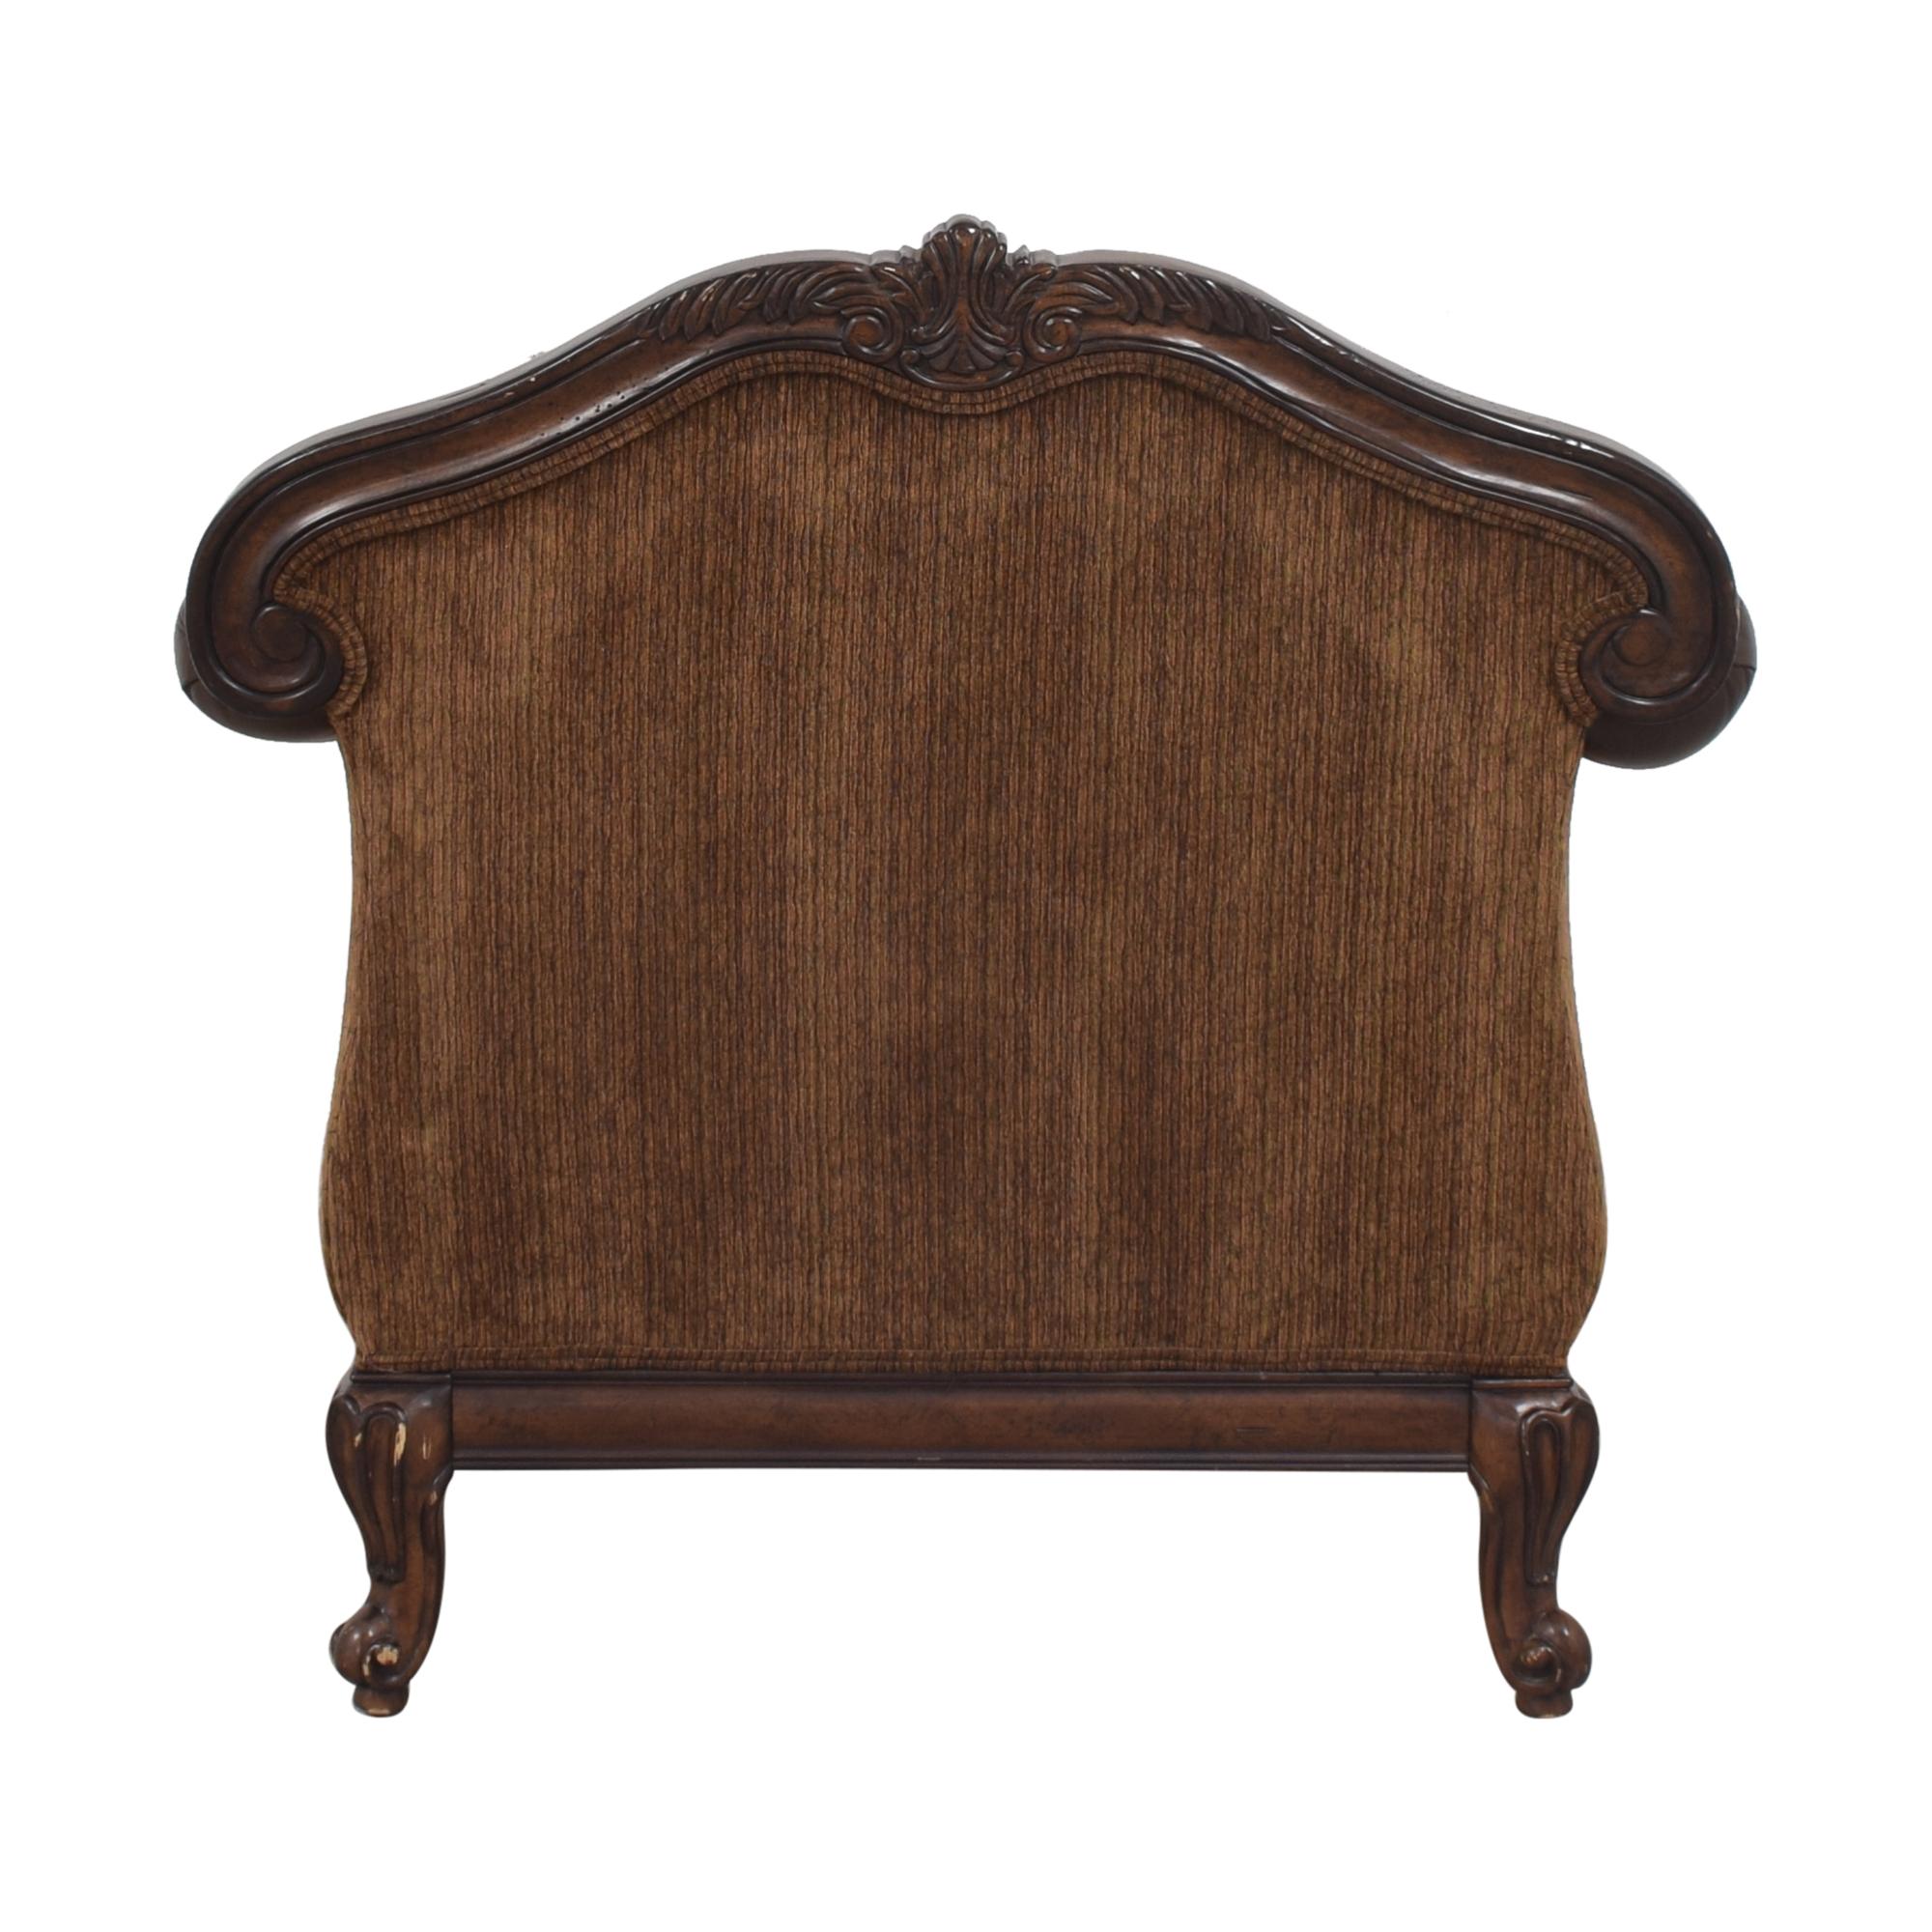 Raymour & Flanigan Raymour & Flanigan Natalia Chair with Ottoman used